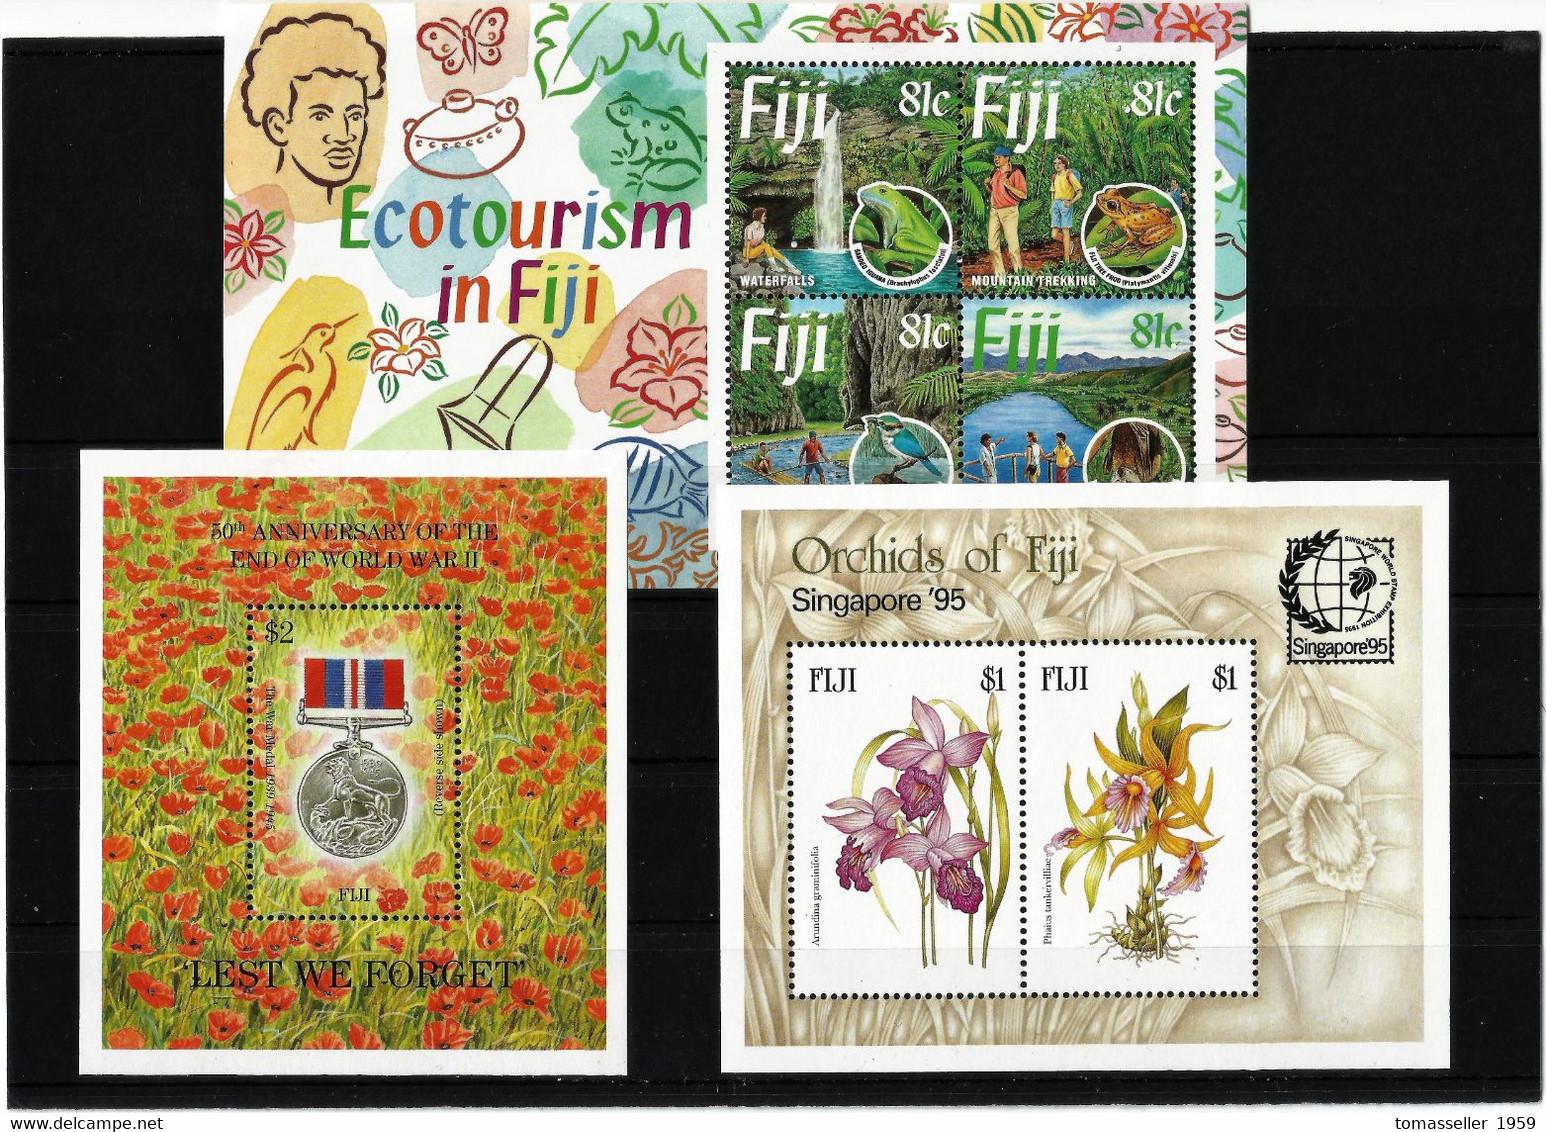 FIDJI - 1994 -95-96-97-98-99-00-01-02-03-04-05-06--07  YEAR SETS . Totaly 378 Stamps+ 49 Block + 2 Min.sheets - Fiji (1970-...)